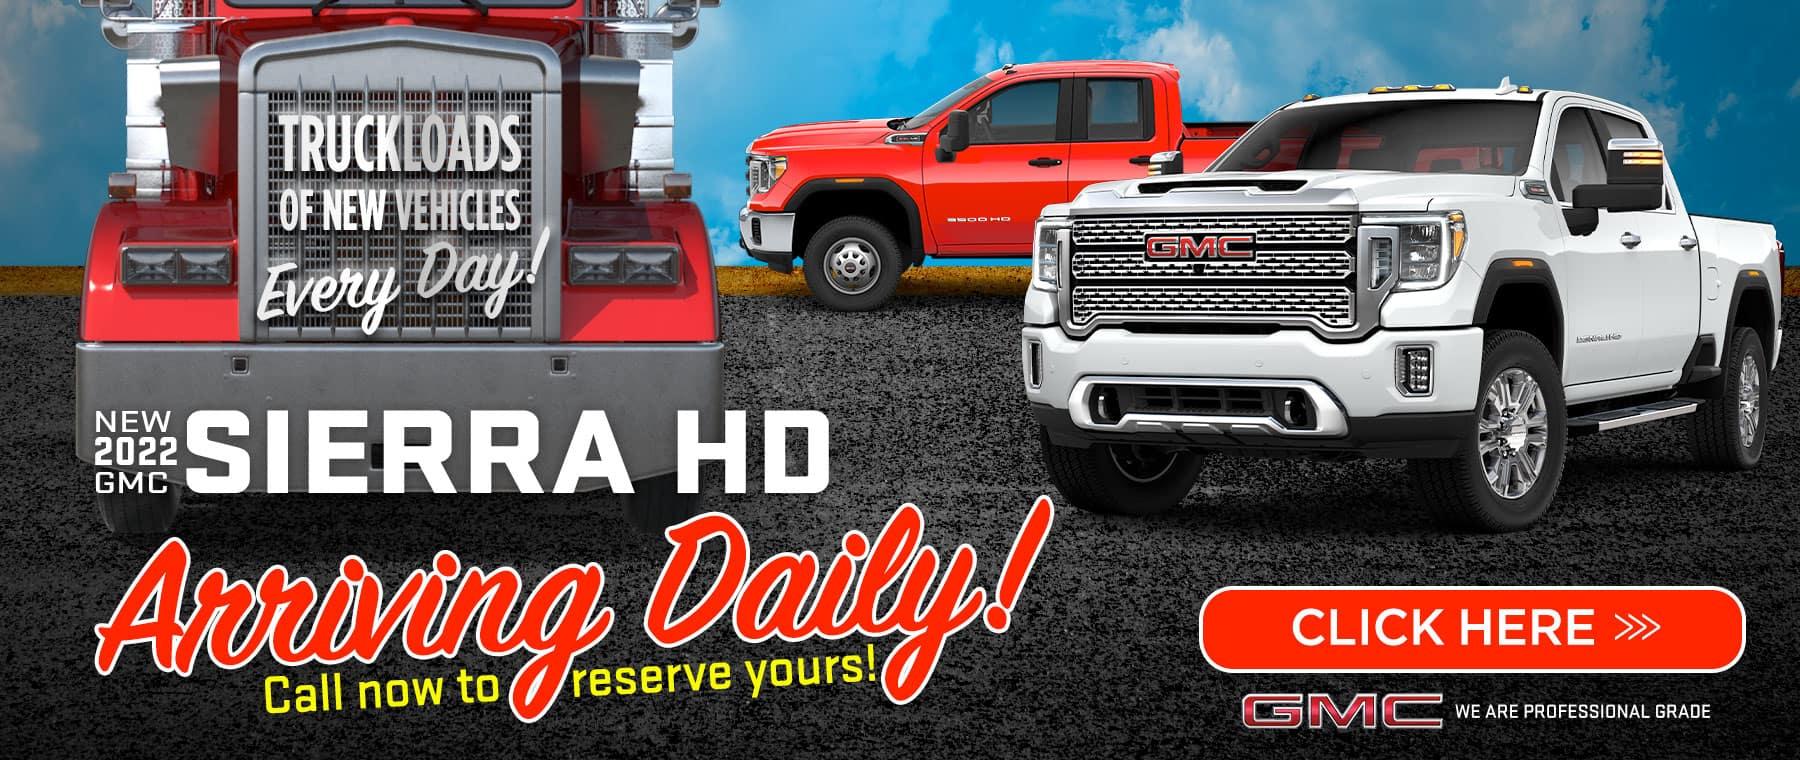 New 2021 GMC Sierra HD - Arriving Daily